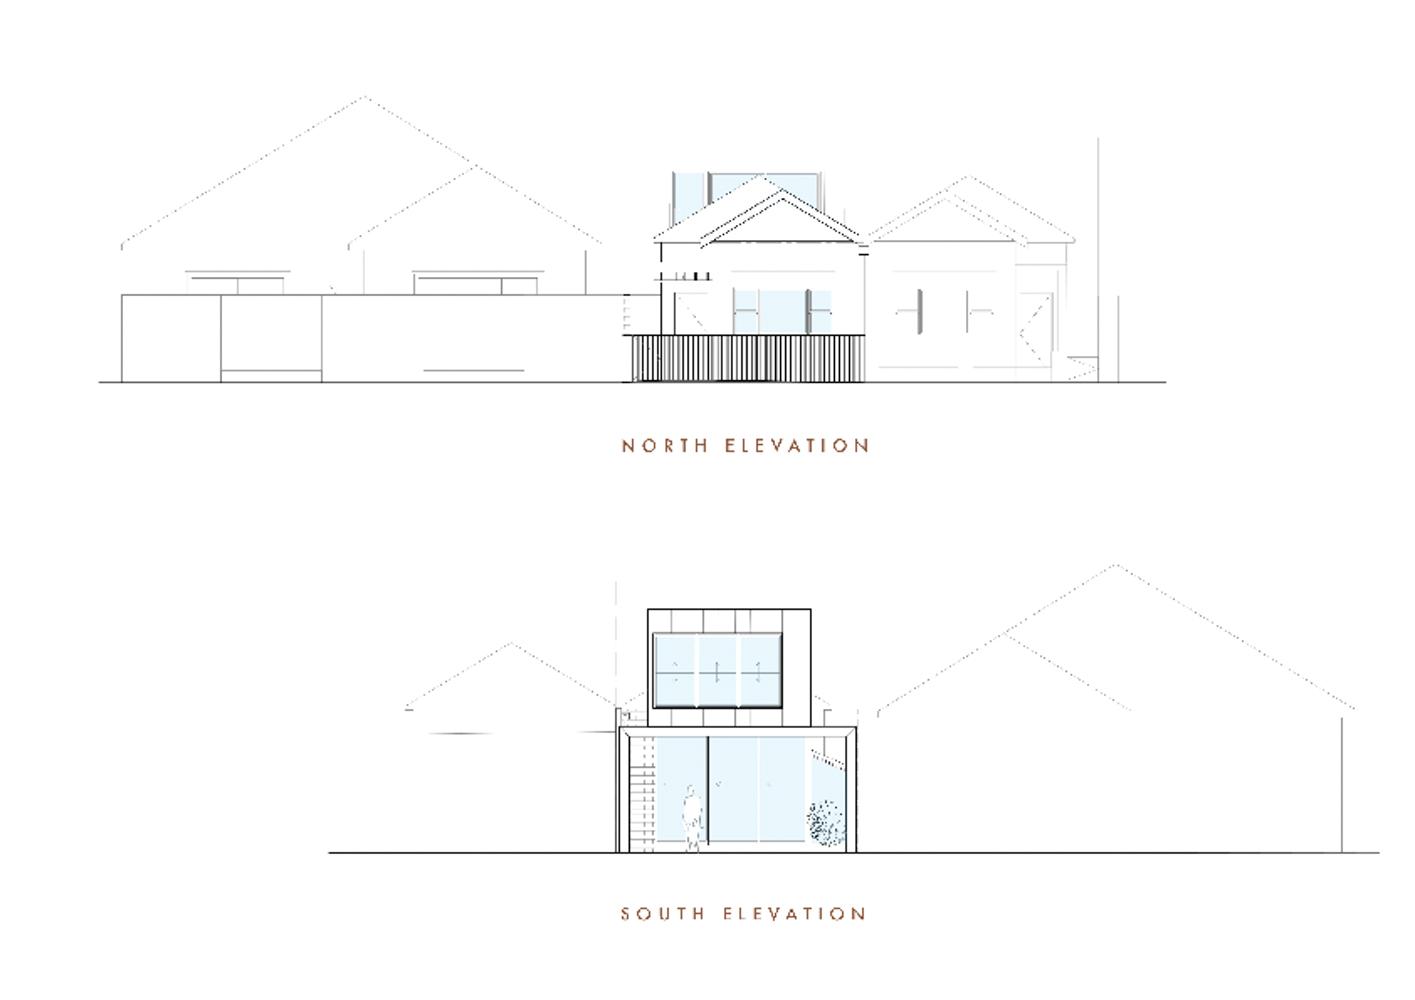 perched-house-rara-architect-the-design-emotive-18.jpg